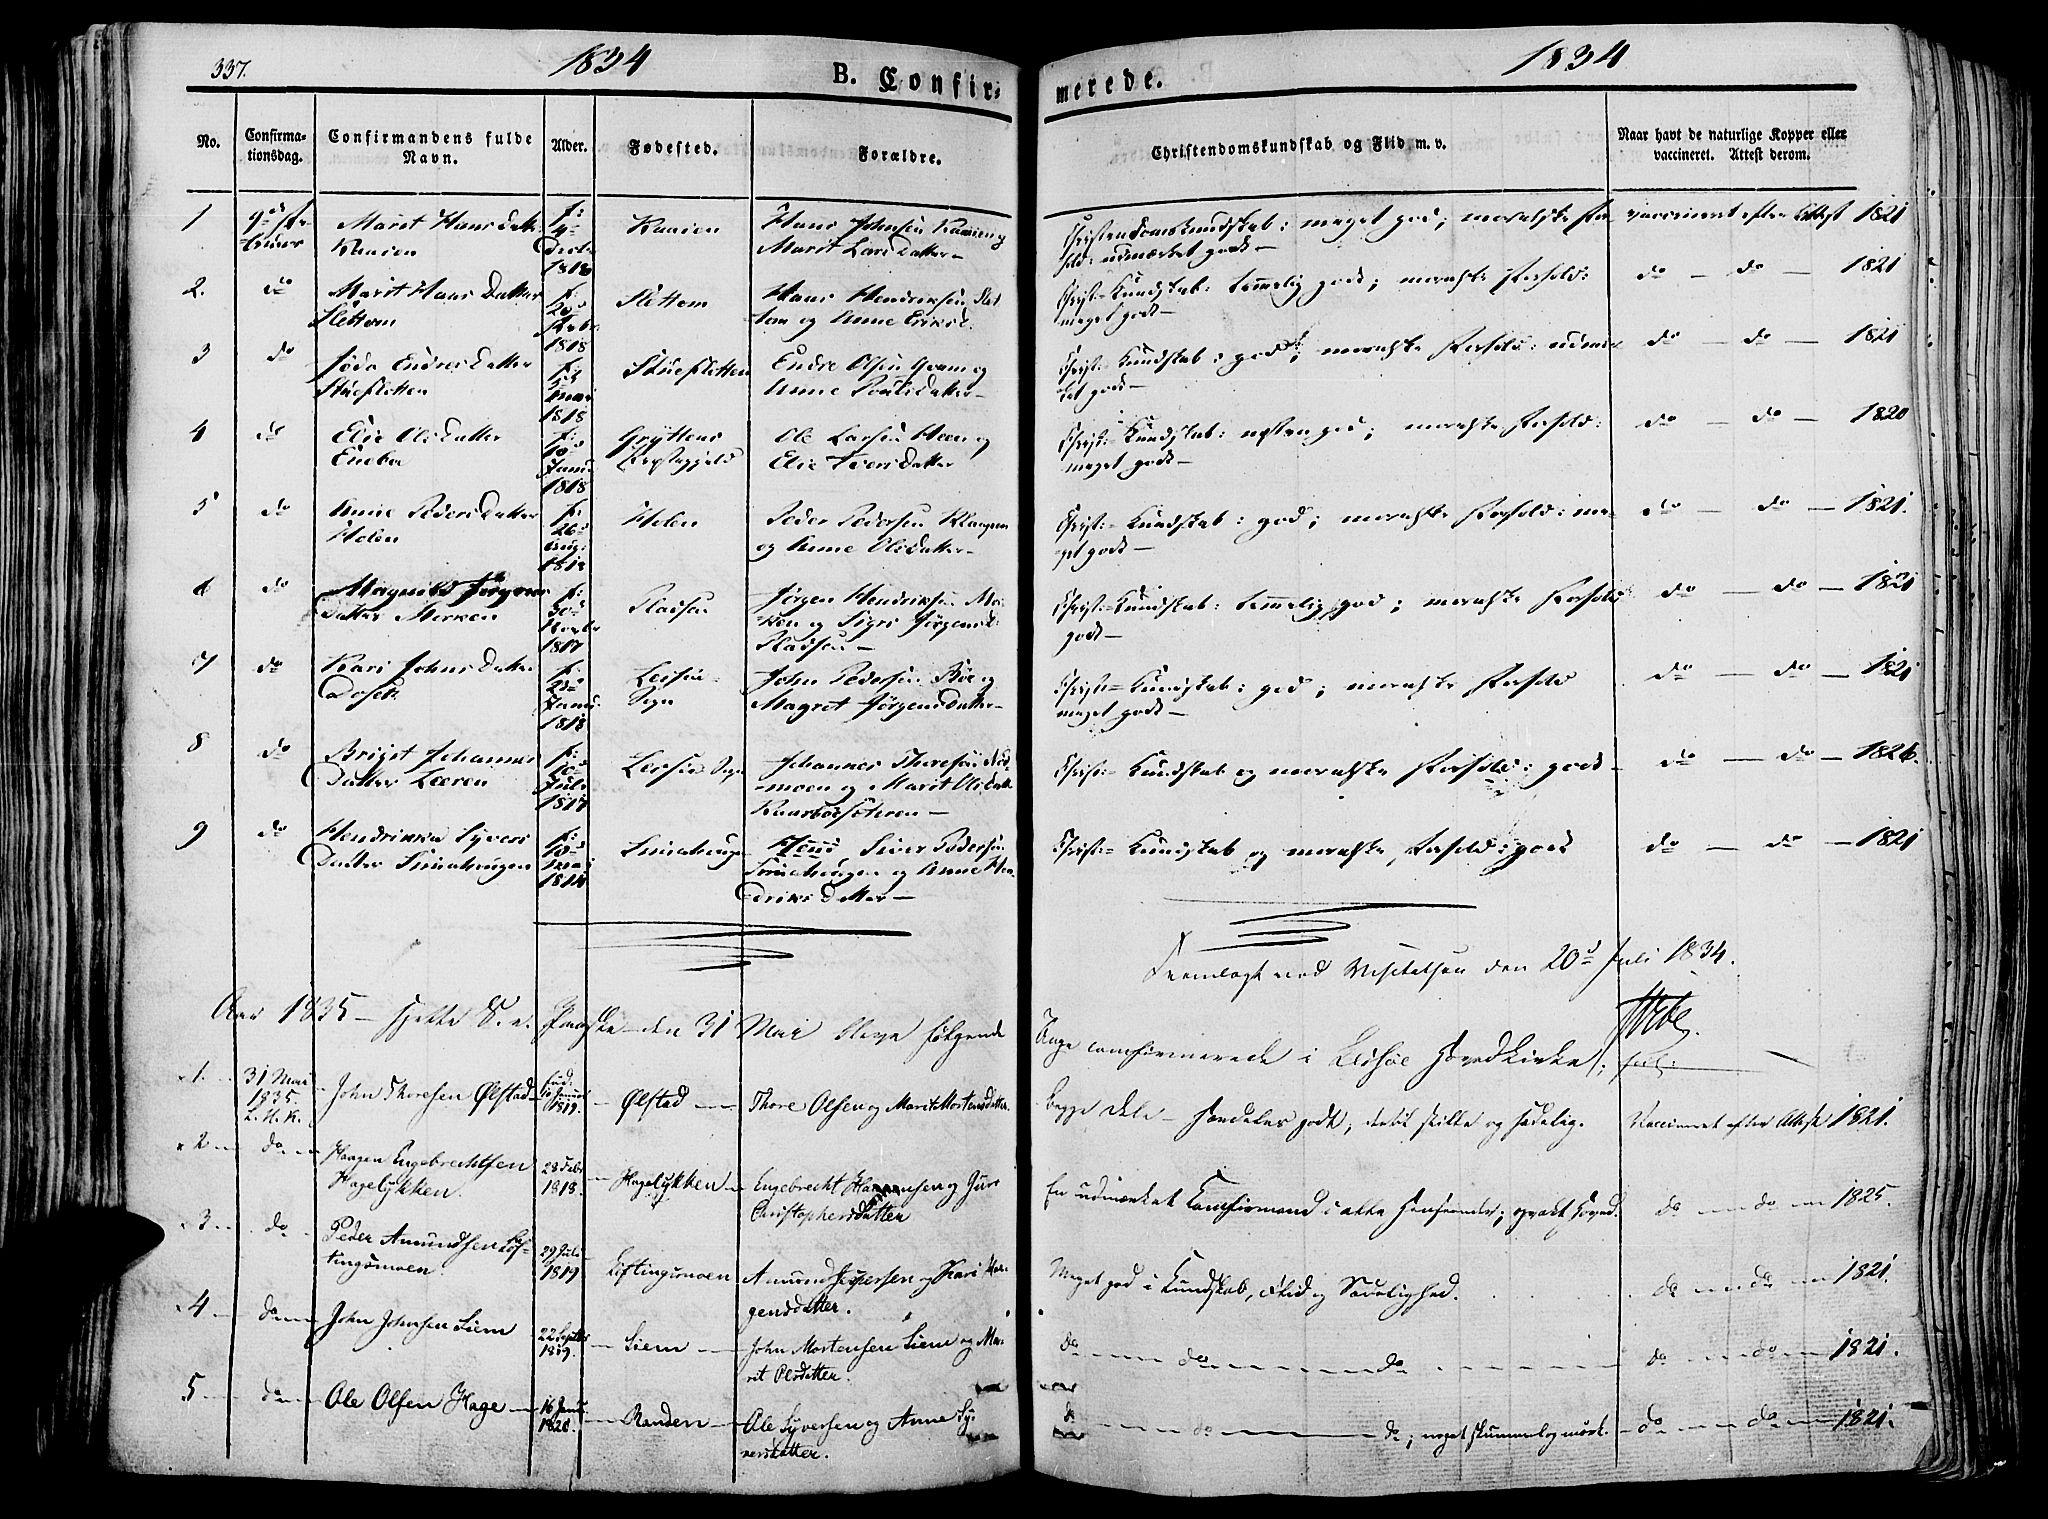 SAH, Lesja prestekontor, Ministerialbok nr. 5, 1830-1842, s. 337